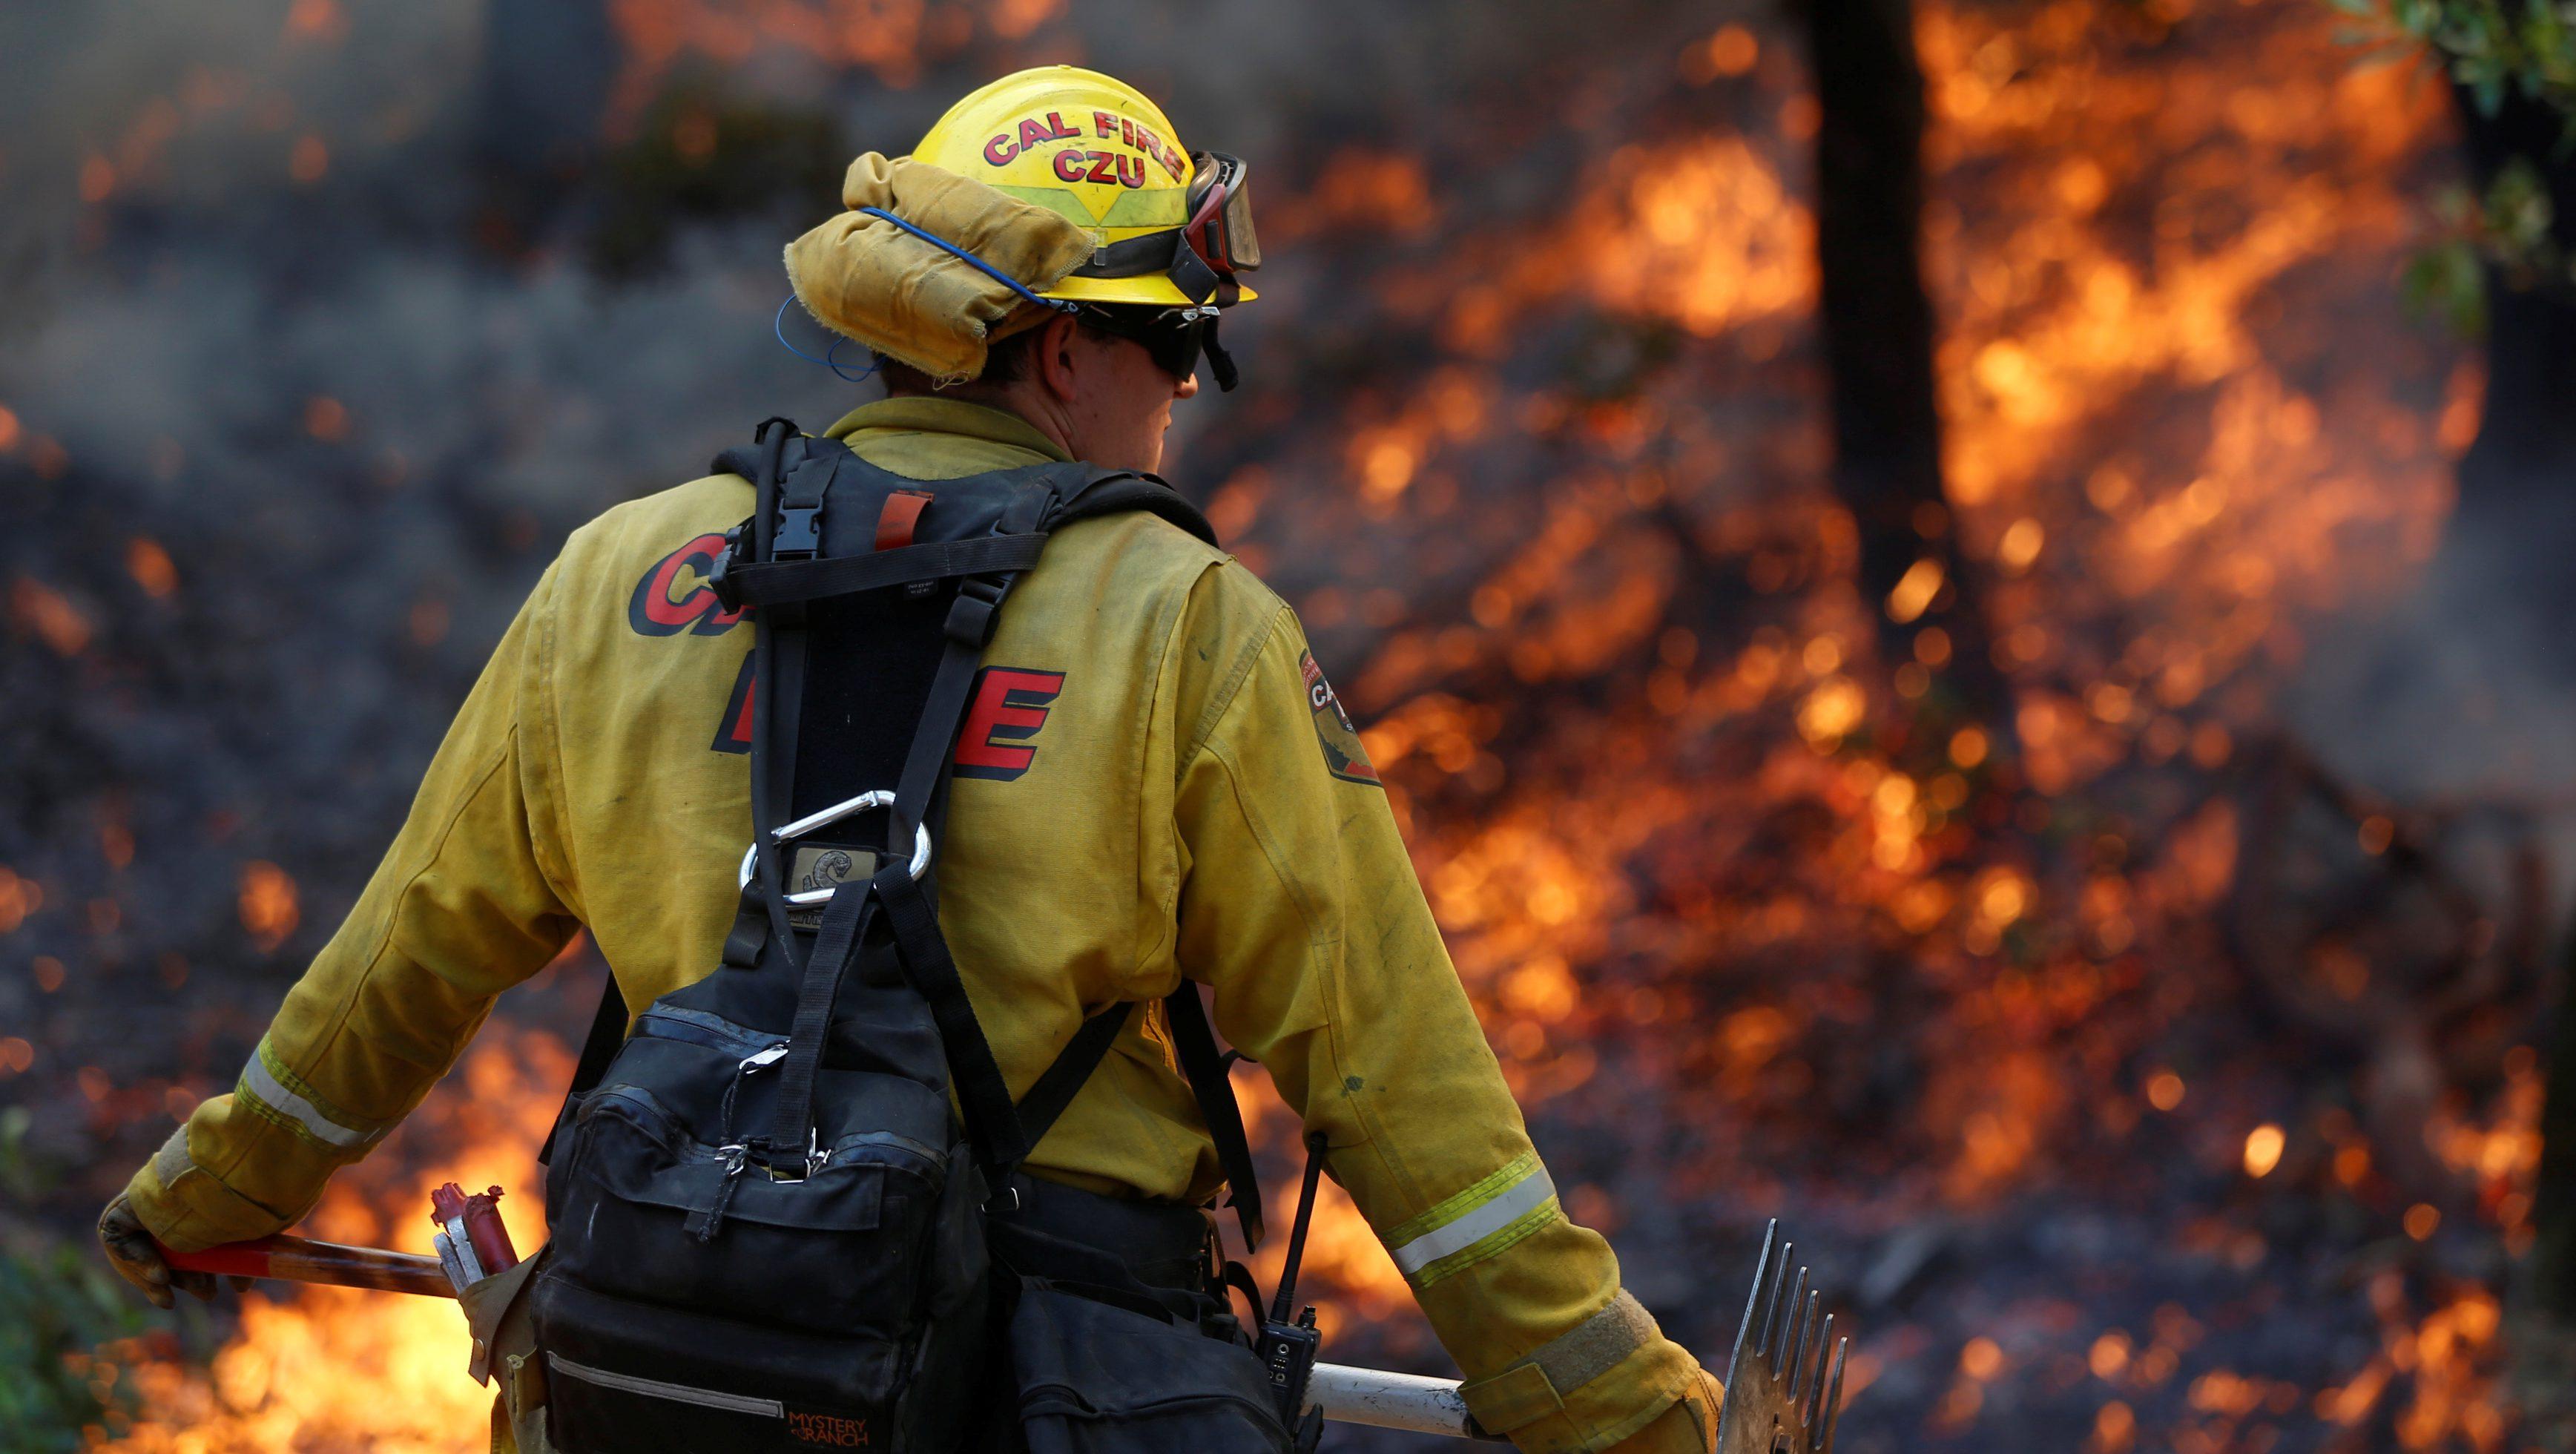 Firefighter fights a blaze in California